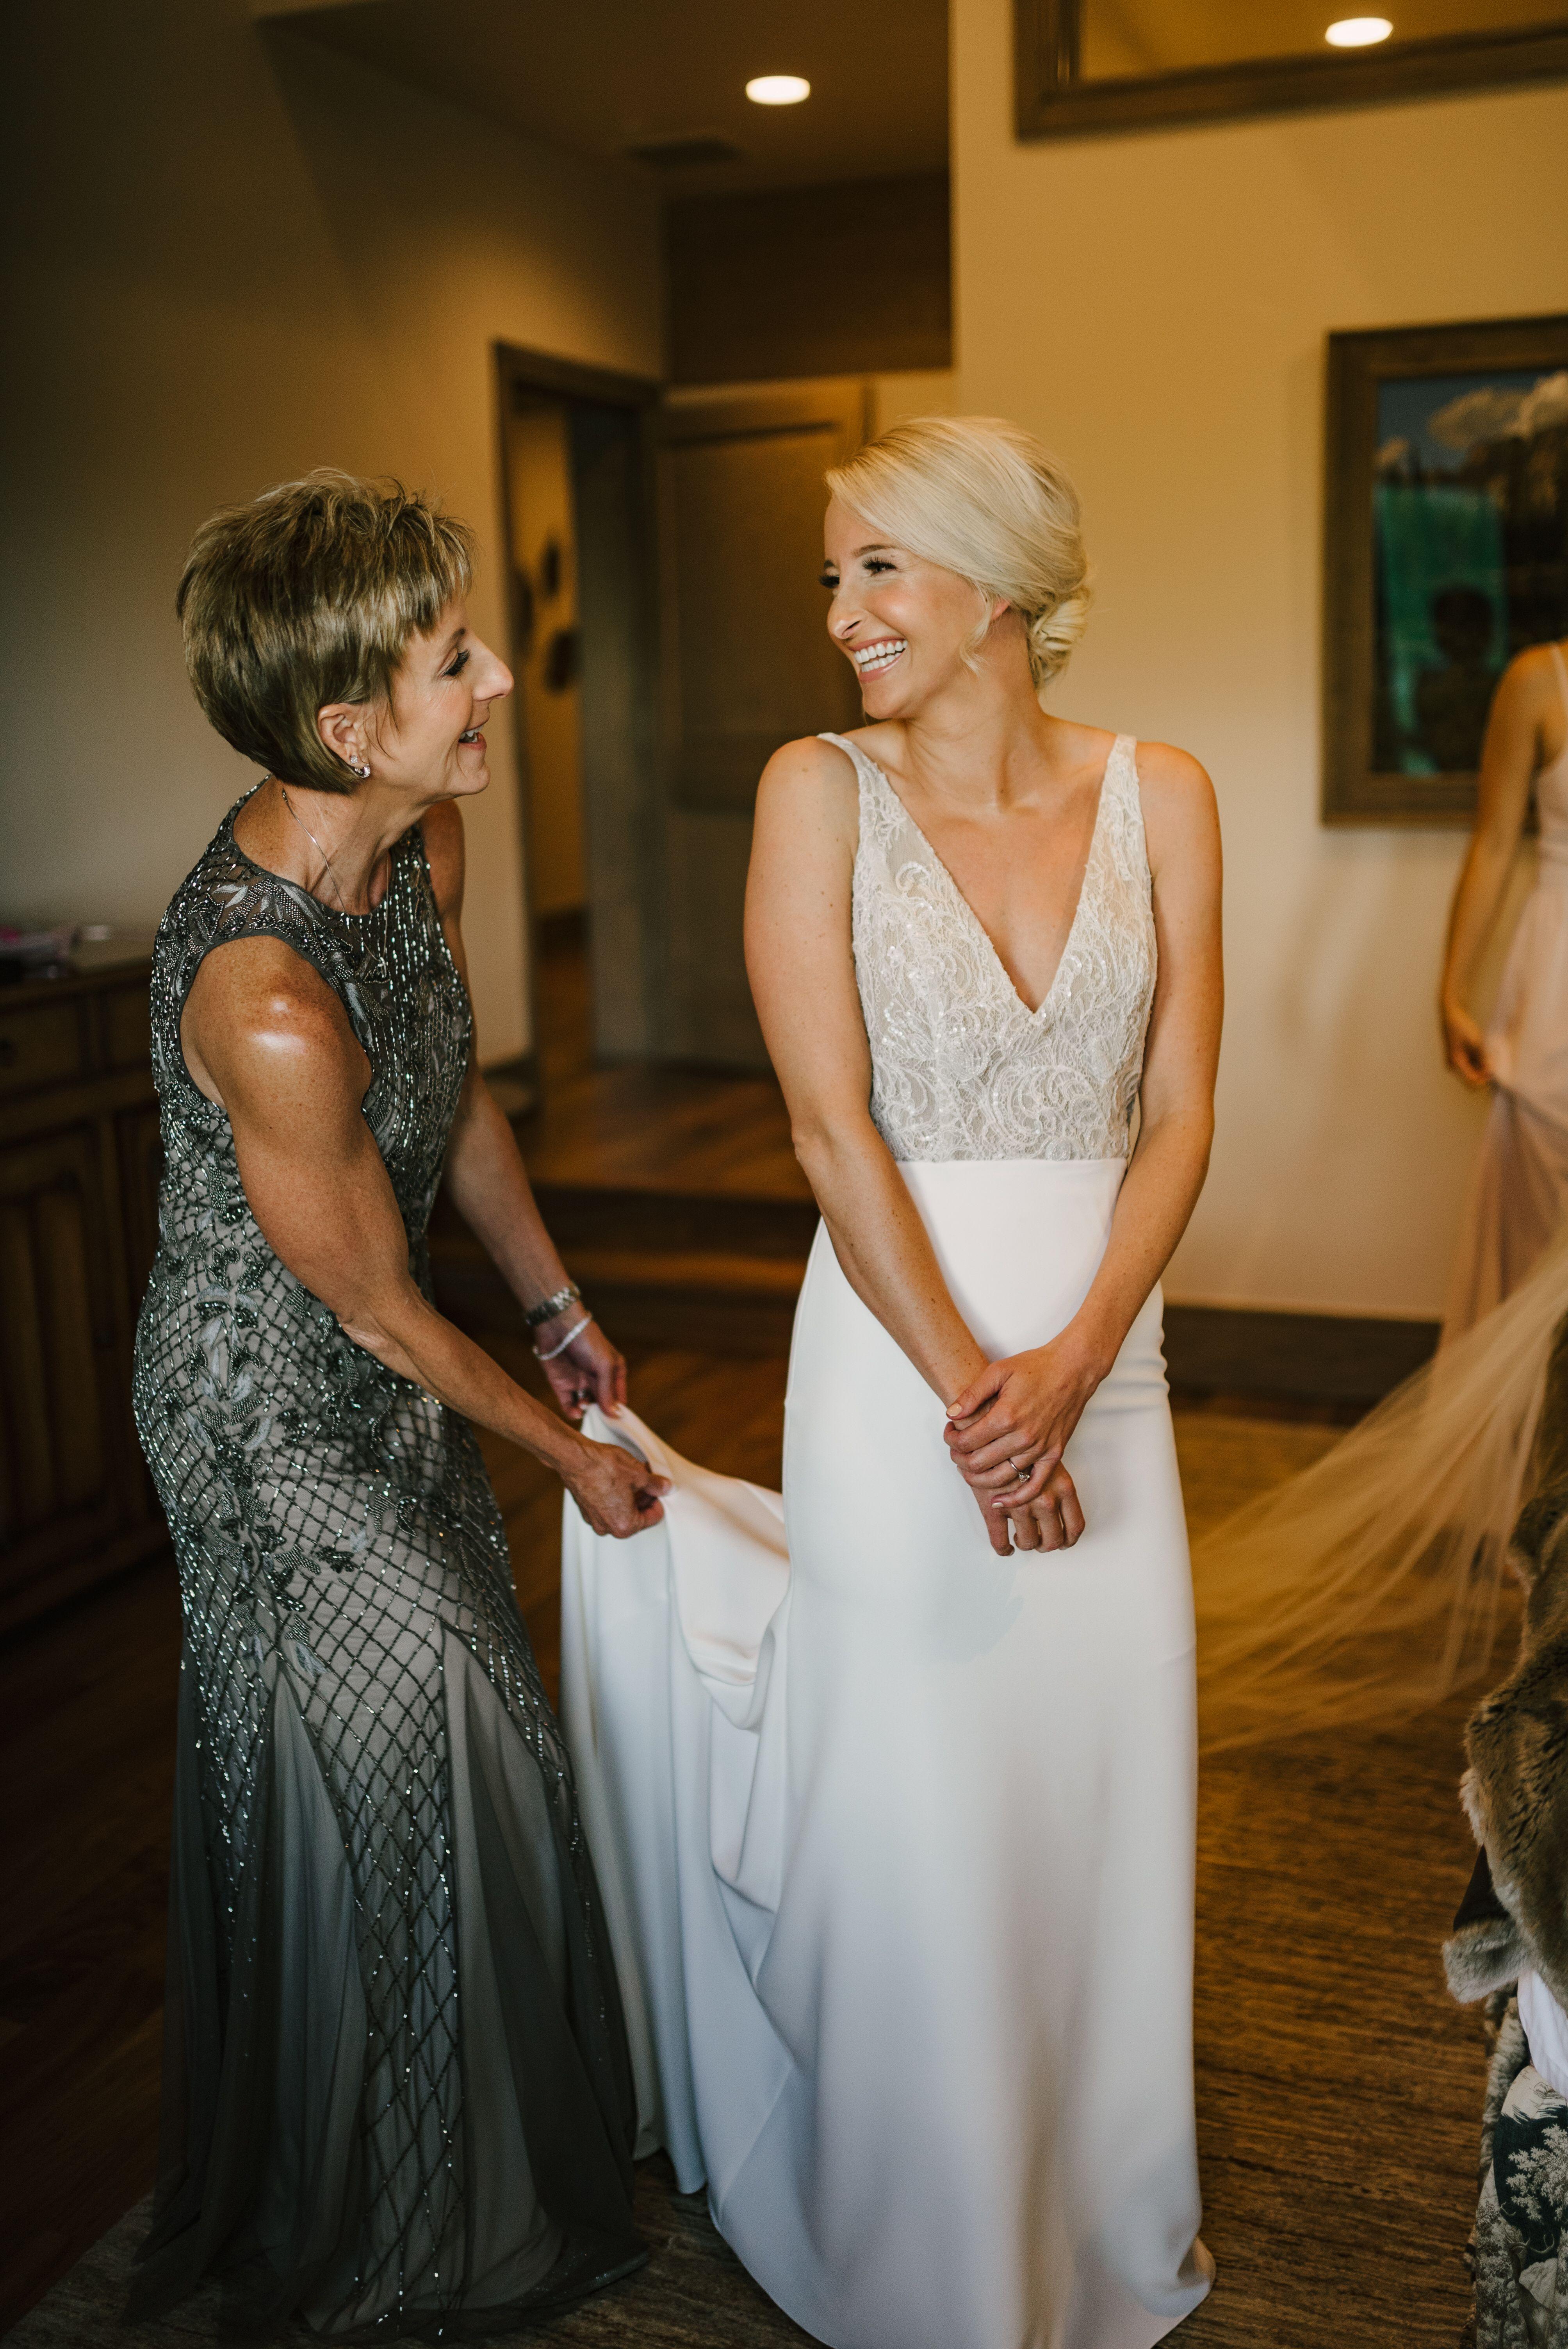 Pin by Sara jeneson on wedding photos   Wedding dresses